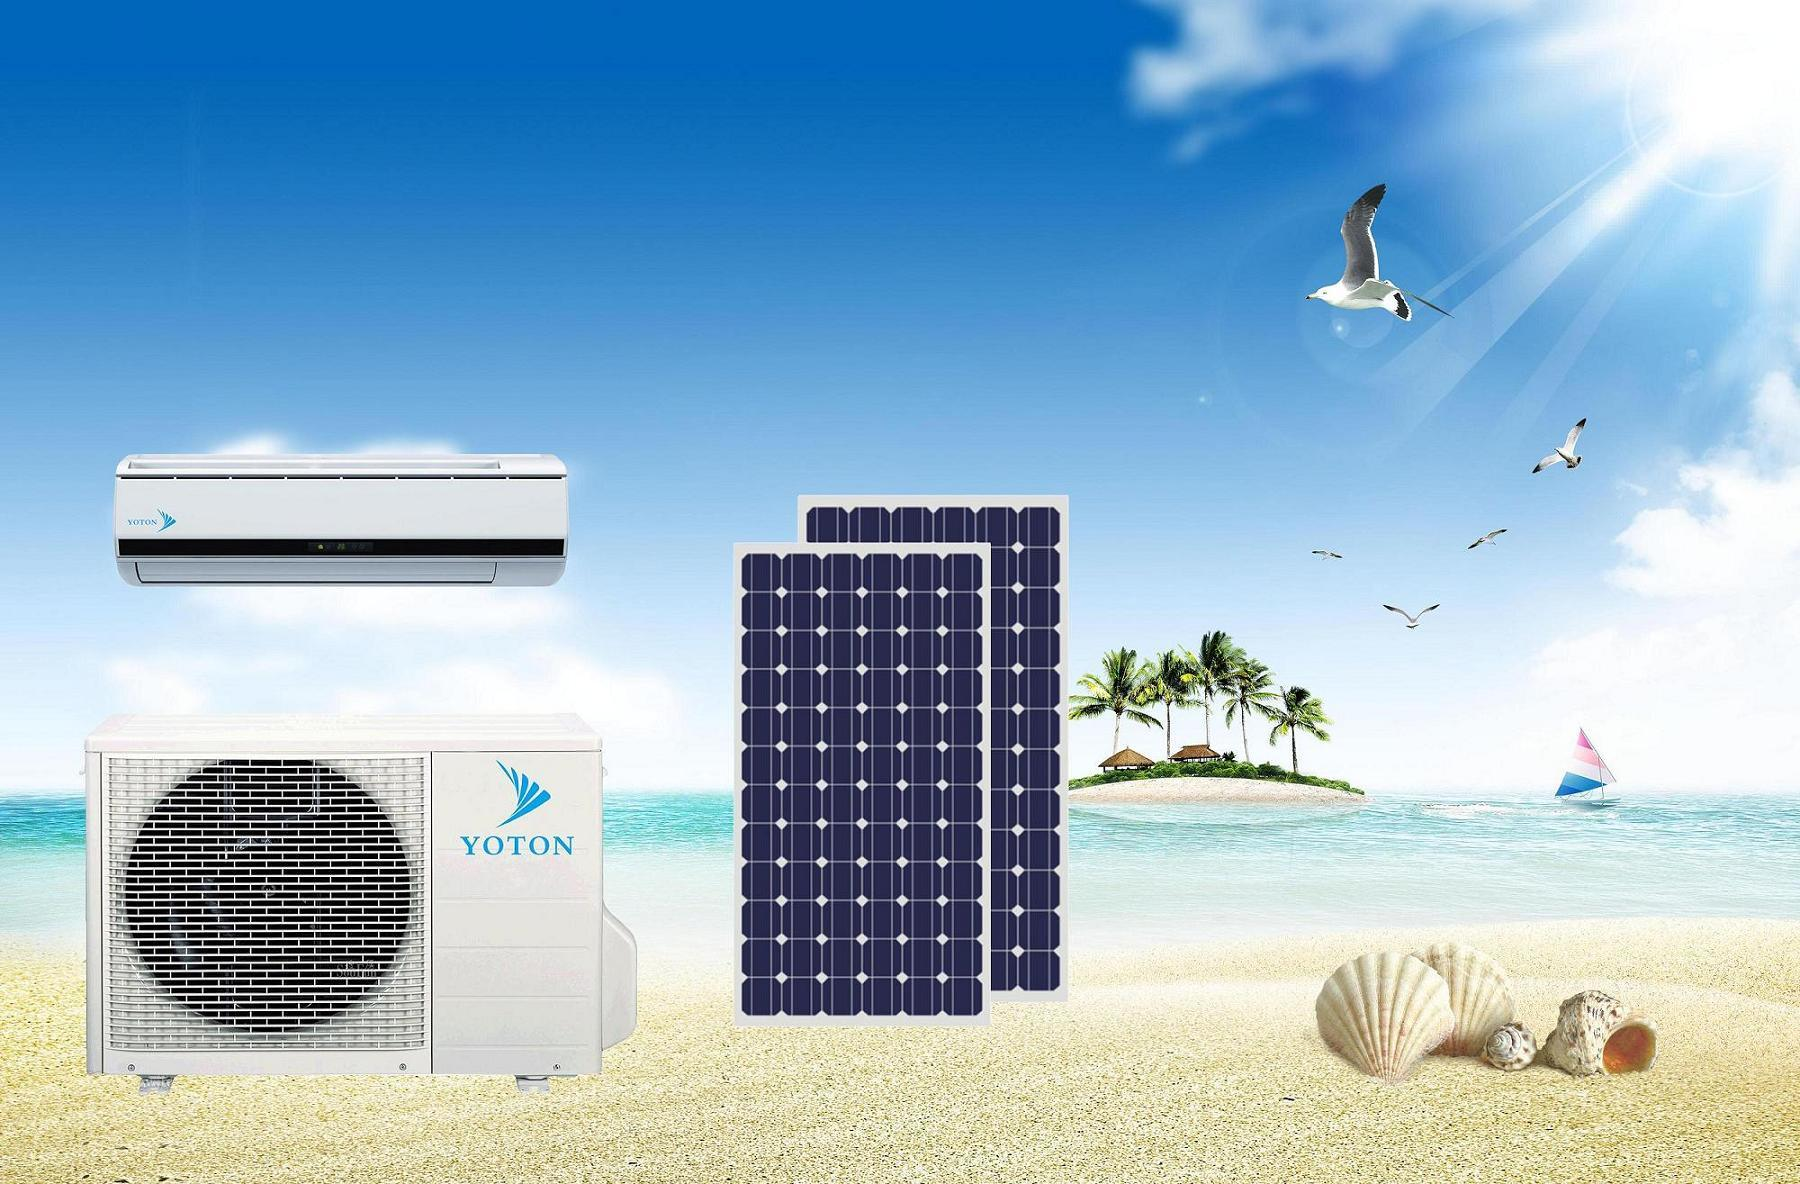 climatiseur solaire 9000btu 12000btu 15000btu climatiseur solaire 9000btu 12000btu 15000btu. Black Bedroom Furniture Sets. Home Design Ideas